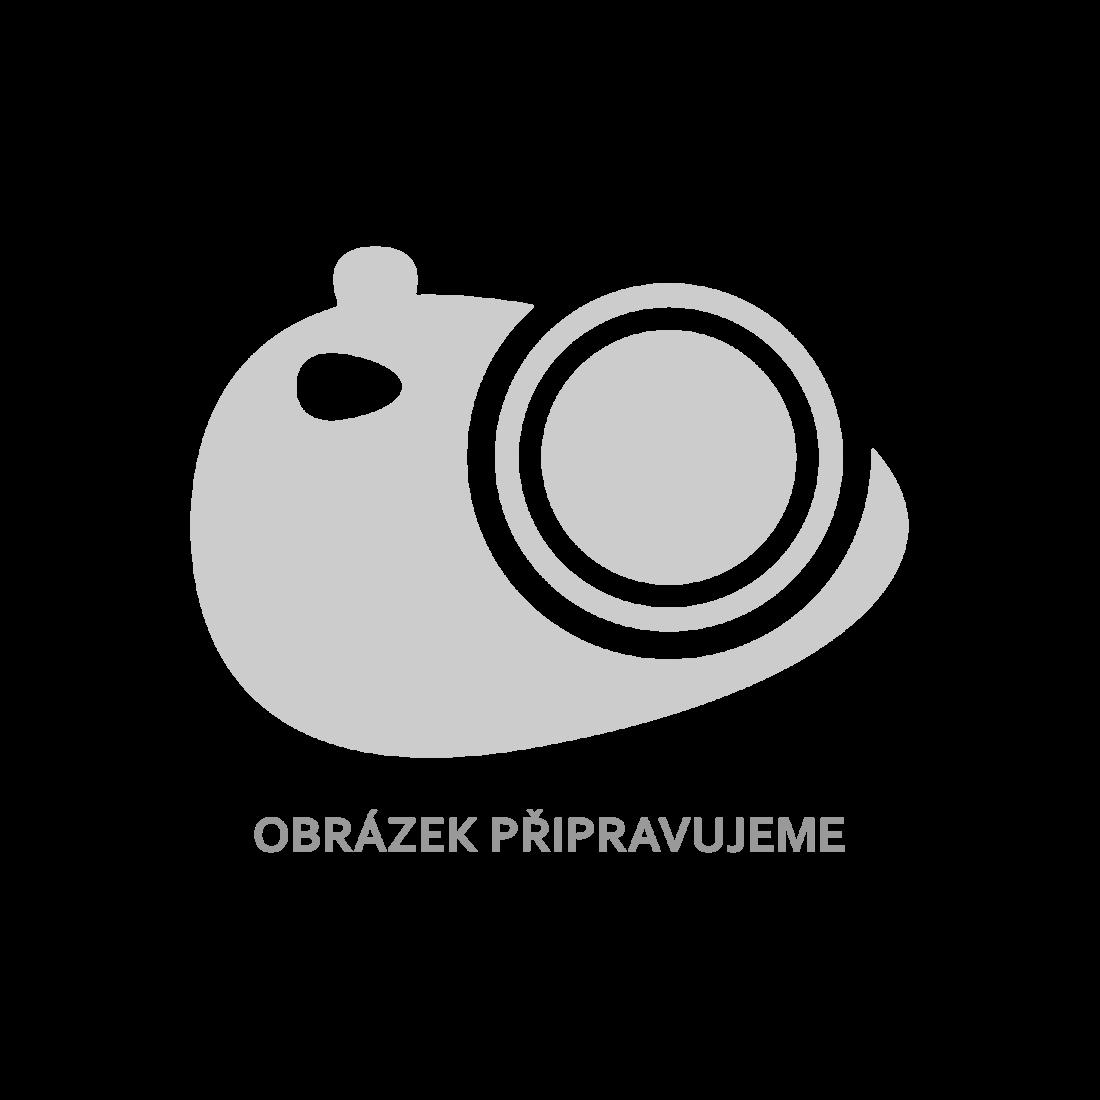 vidaXL Konferenční stolek bílý a dub sonoma 79,5x79,5x30cm dřevotříska [802908]